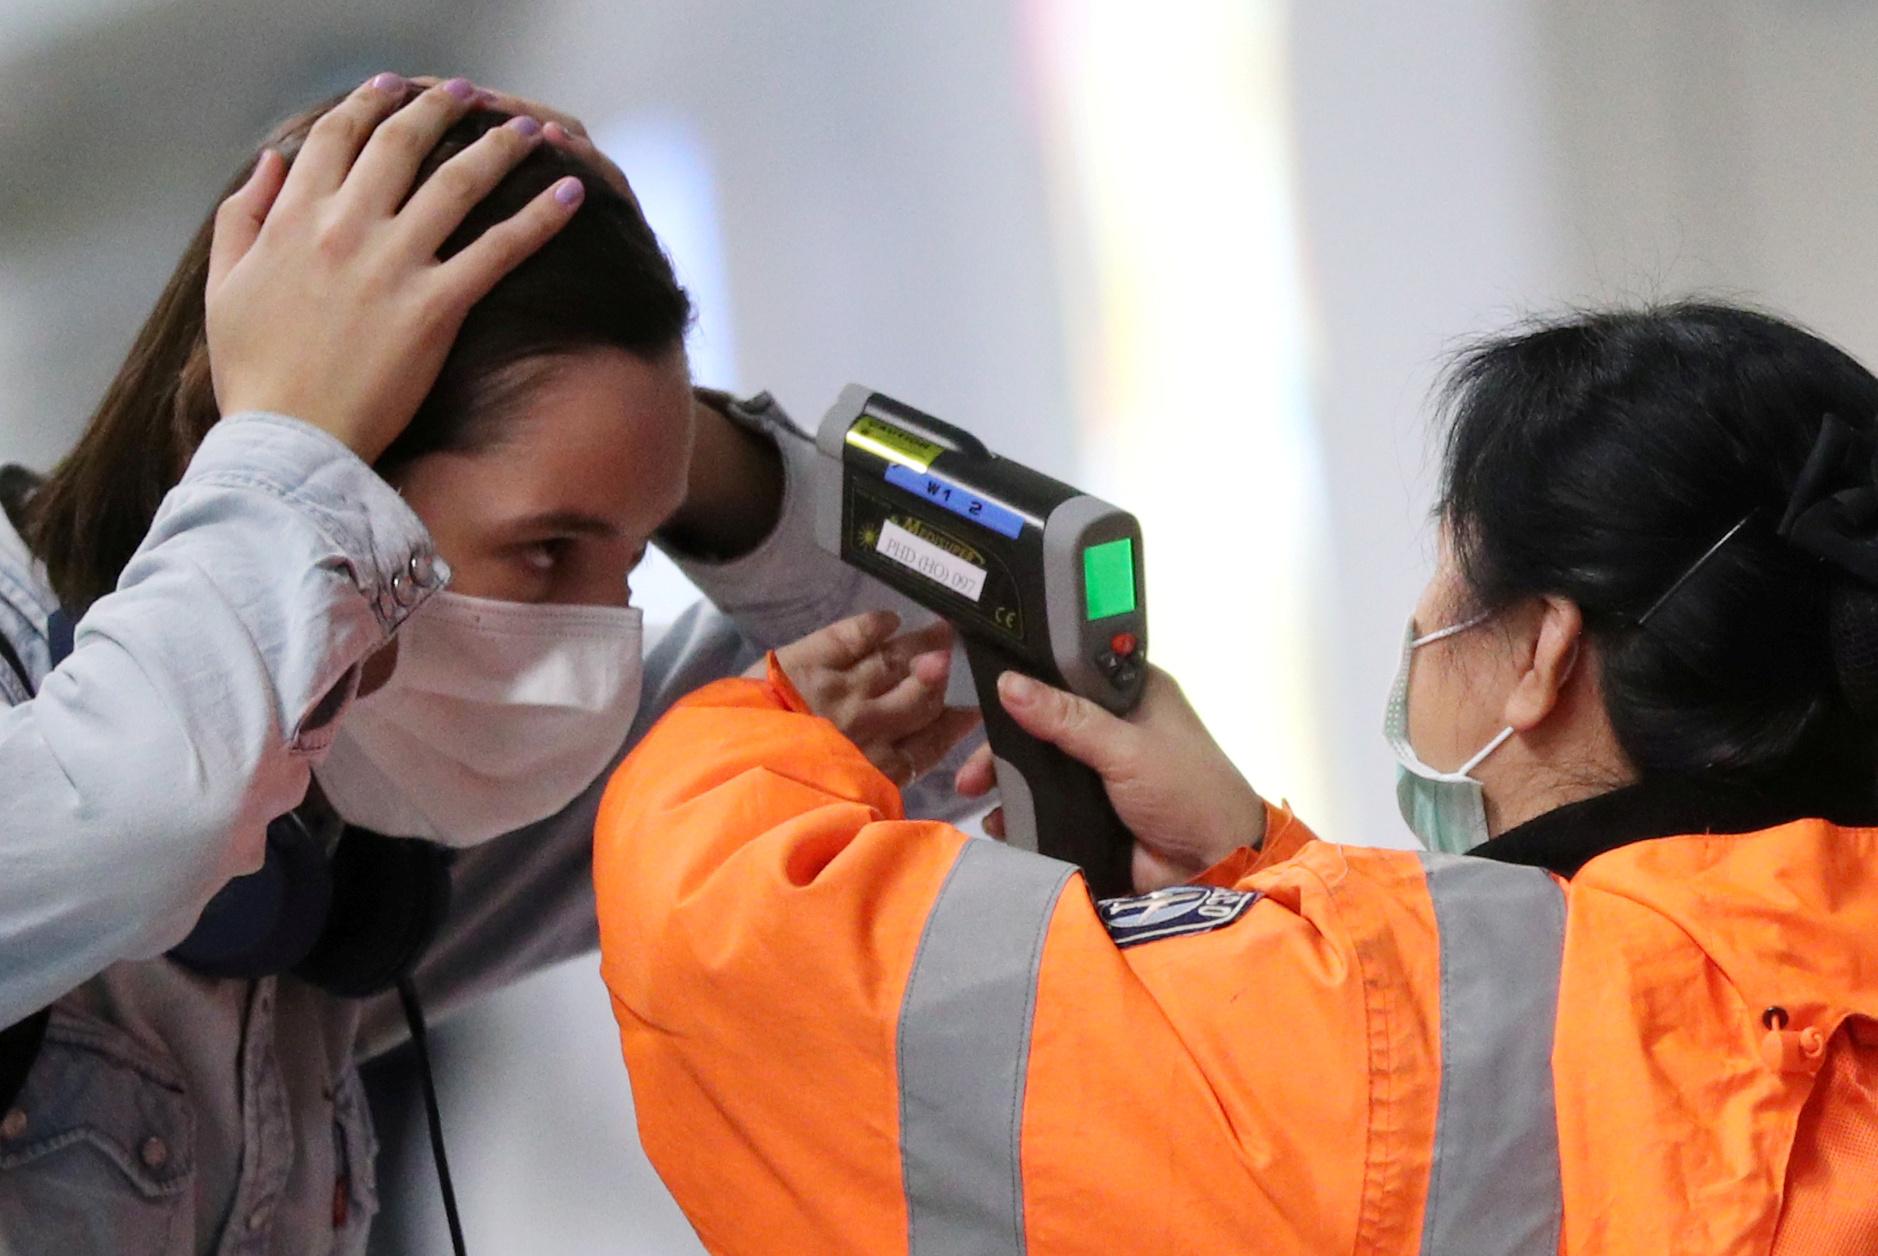 controle-temperature-coronavirus-covid-19-aeroport-hong-kong-chine 20200504143925